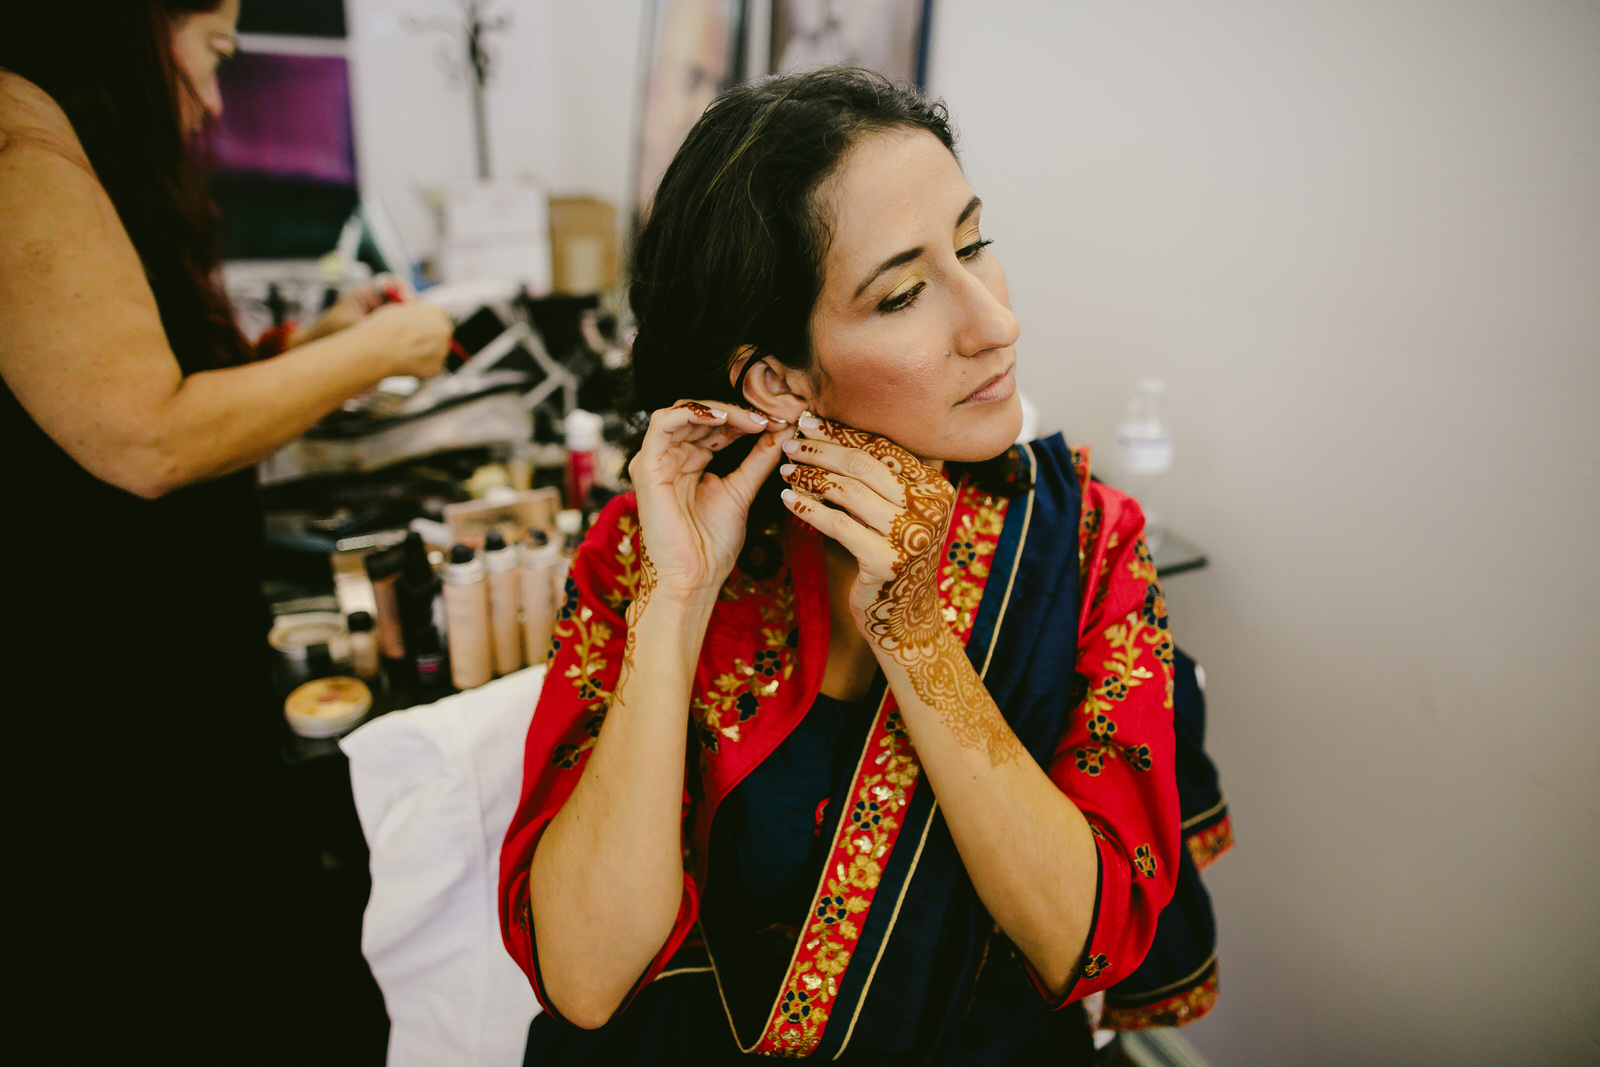 kashi-ashram-wedding-weekend-saturday-rehearsal-dinner-138.jpg